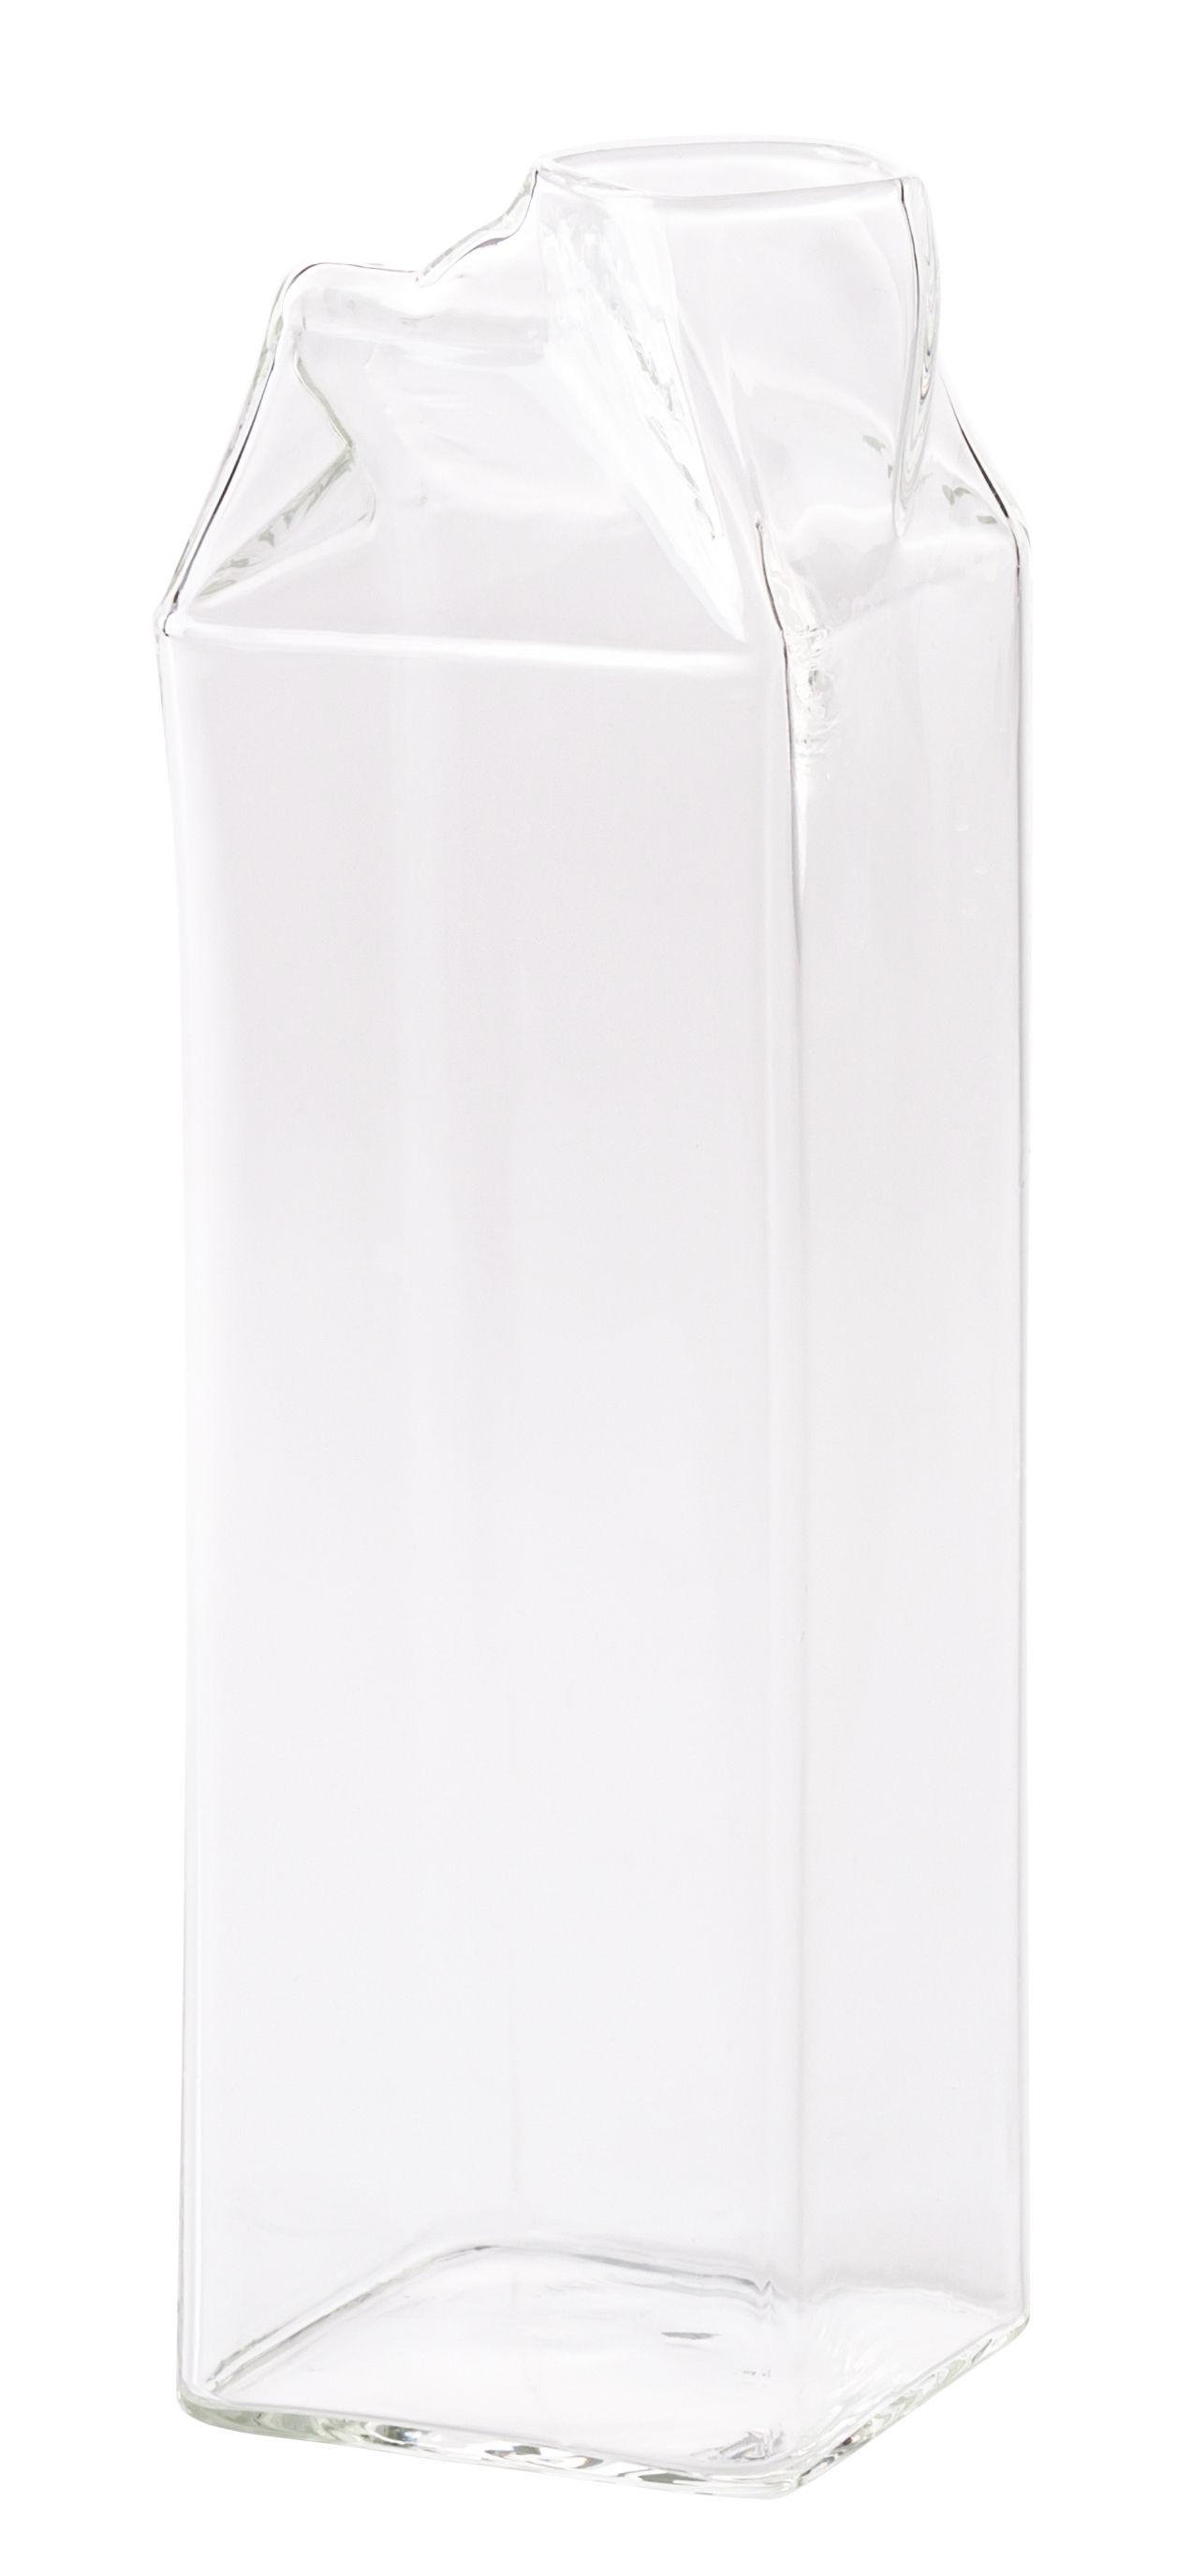 Tableware - Water Carafes & Wine Decanters - Estetico Quotidiano Carafe - Milk pot by Seletti - Transparent - Borosilicate glass